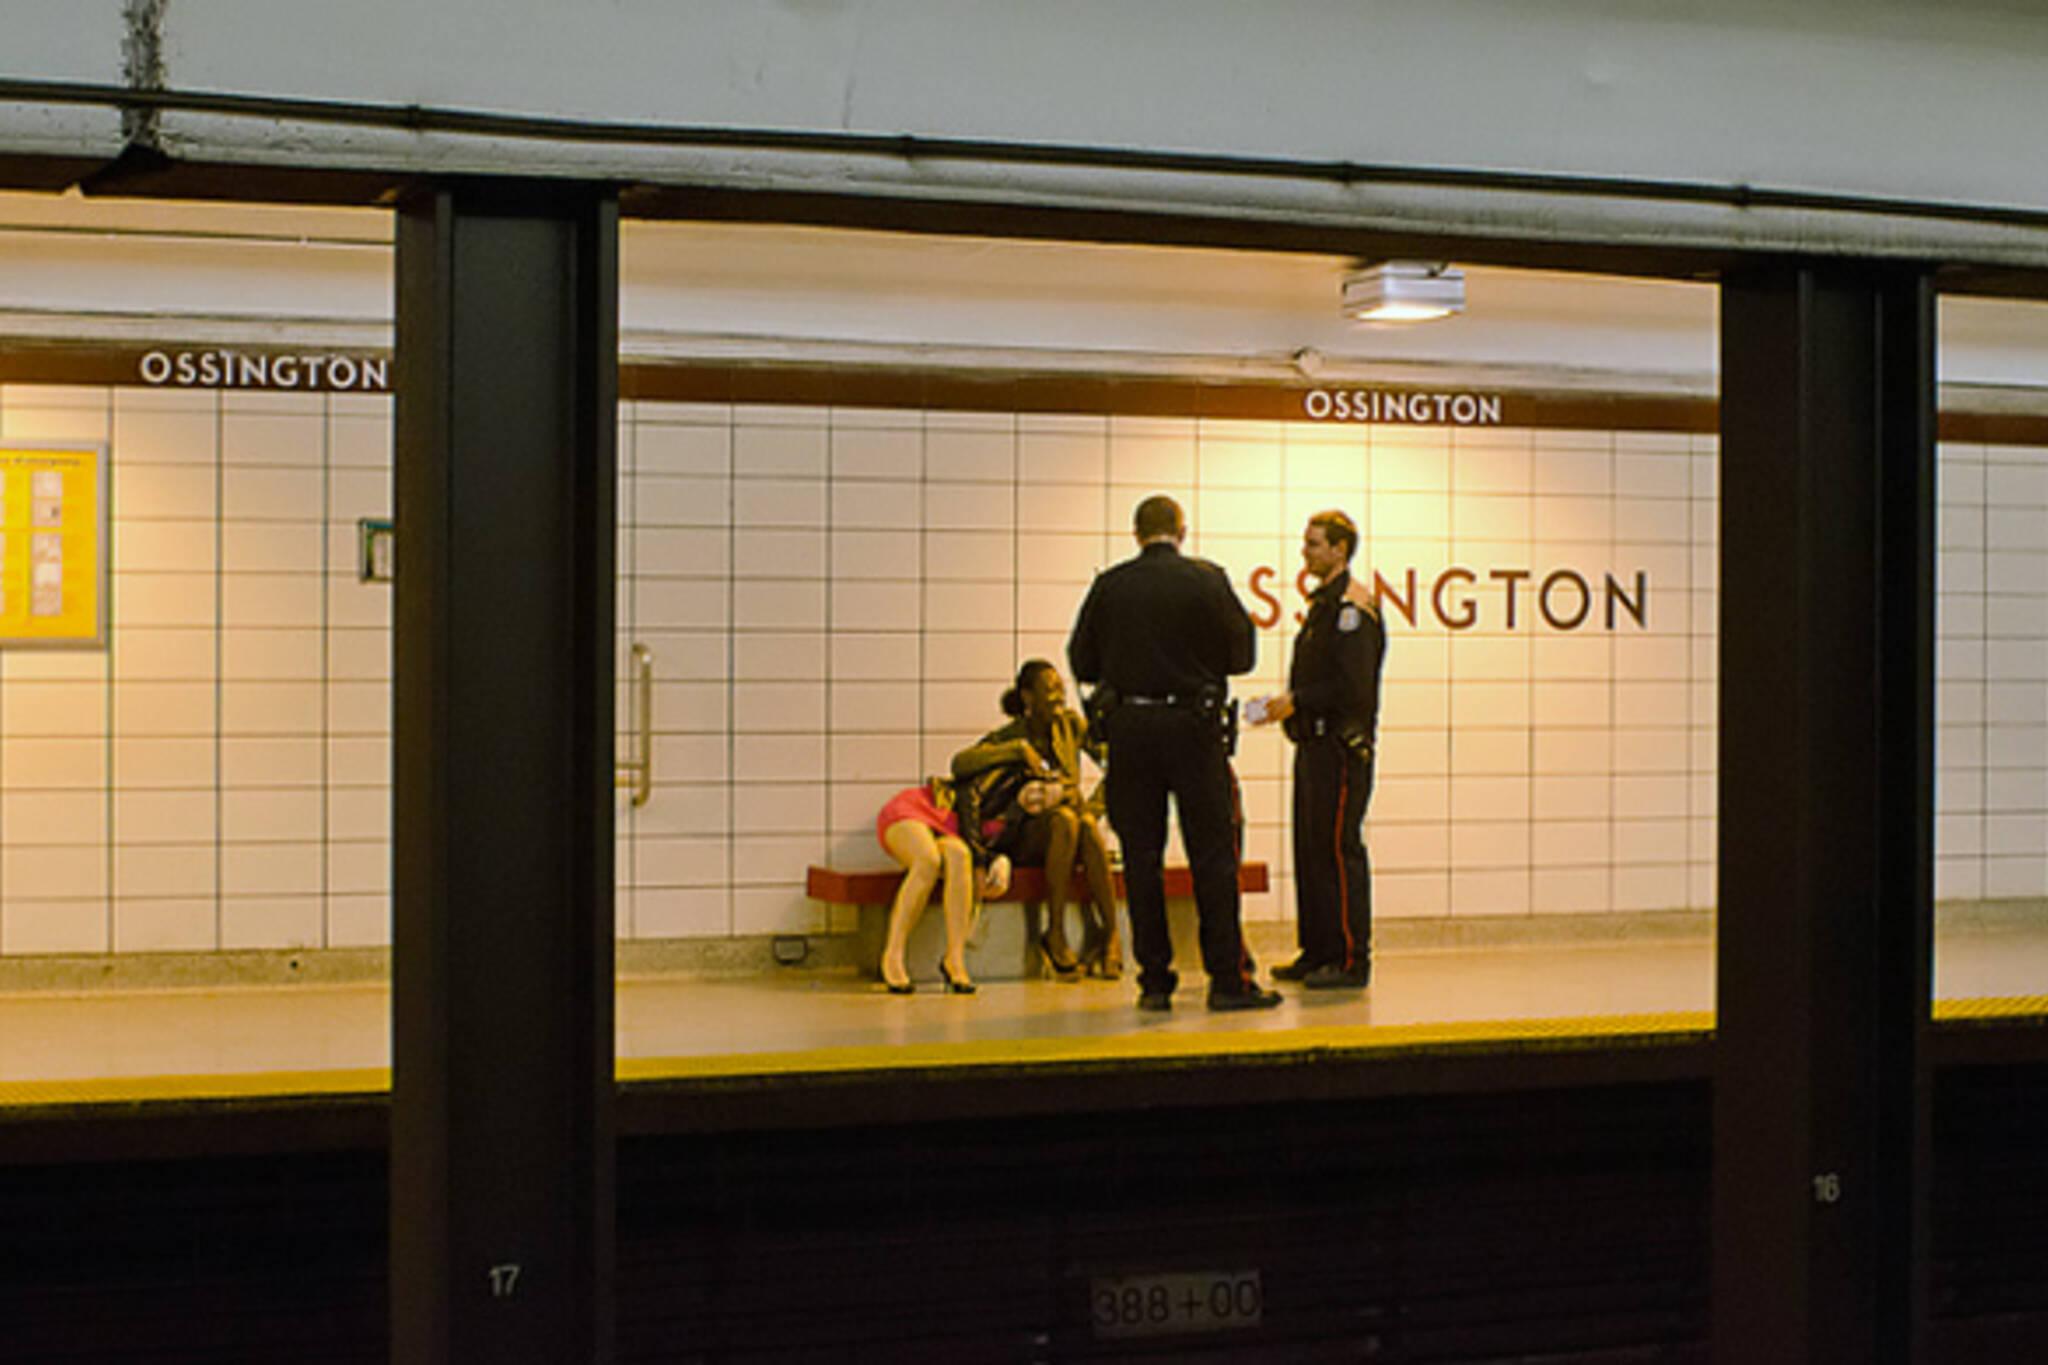 Ossington Station